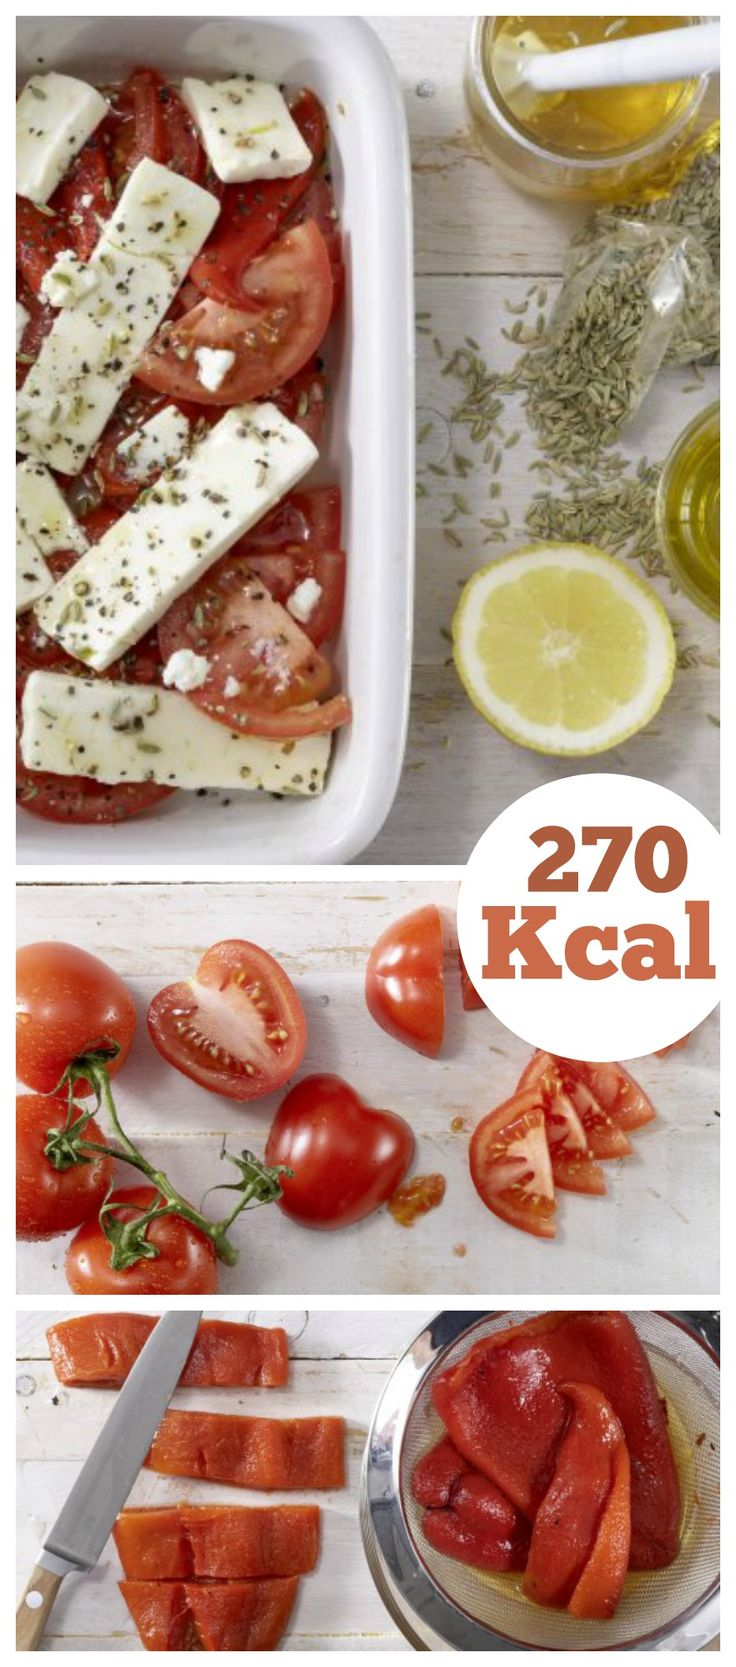 Besonders würzige Version des griechischen Vorspeisenklassikers: Gebackener Schafskäse mit Tomaten und Paprika   http://eatsmarter.de/rezepte/gebackener-schafskaese